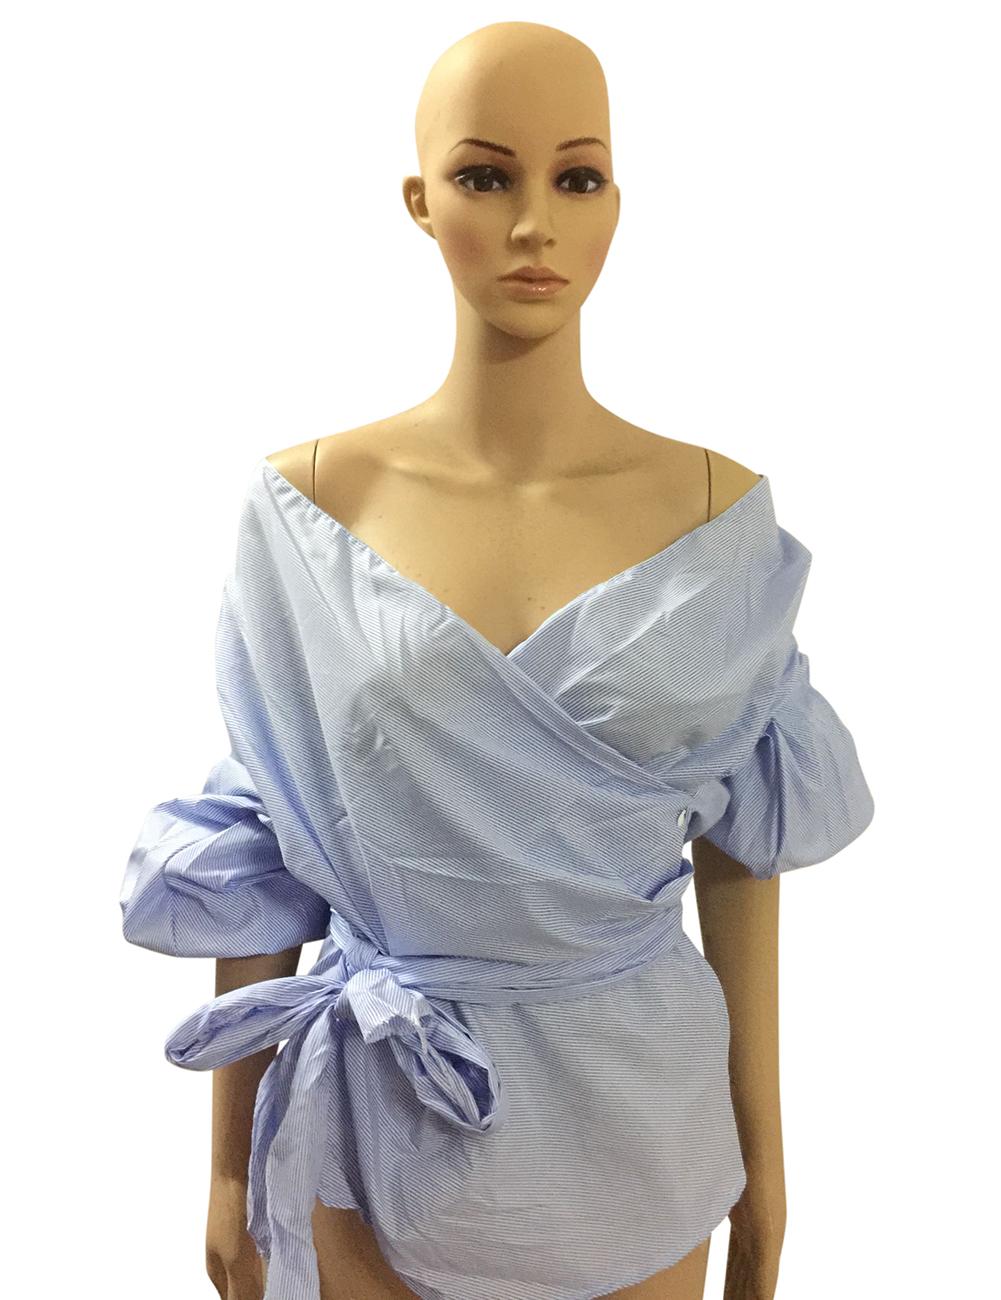 Women Solid Color V-Collar Bandage Tops Slim Design Puff Sleeve Off-shoulder Sexy Tops Shirt